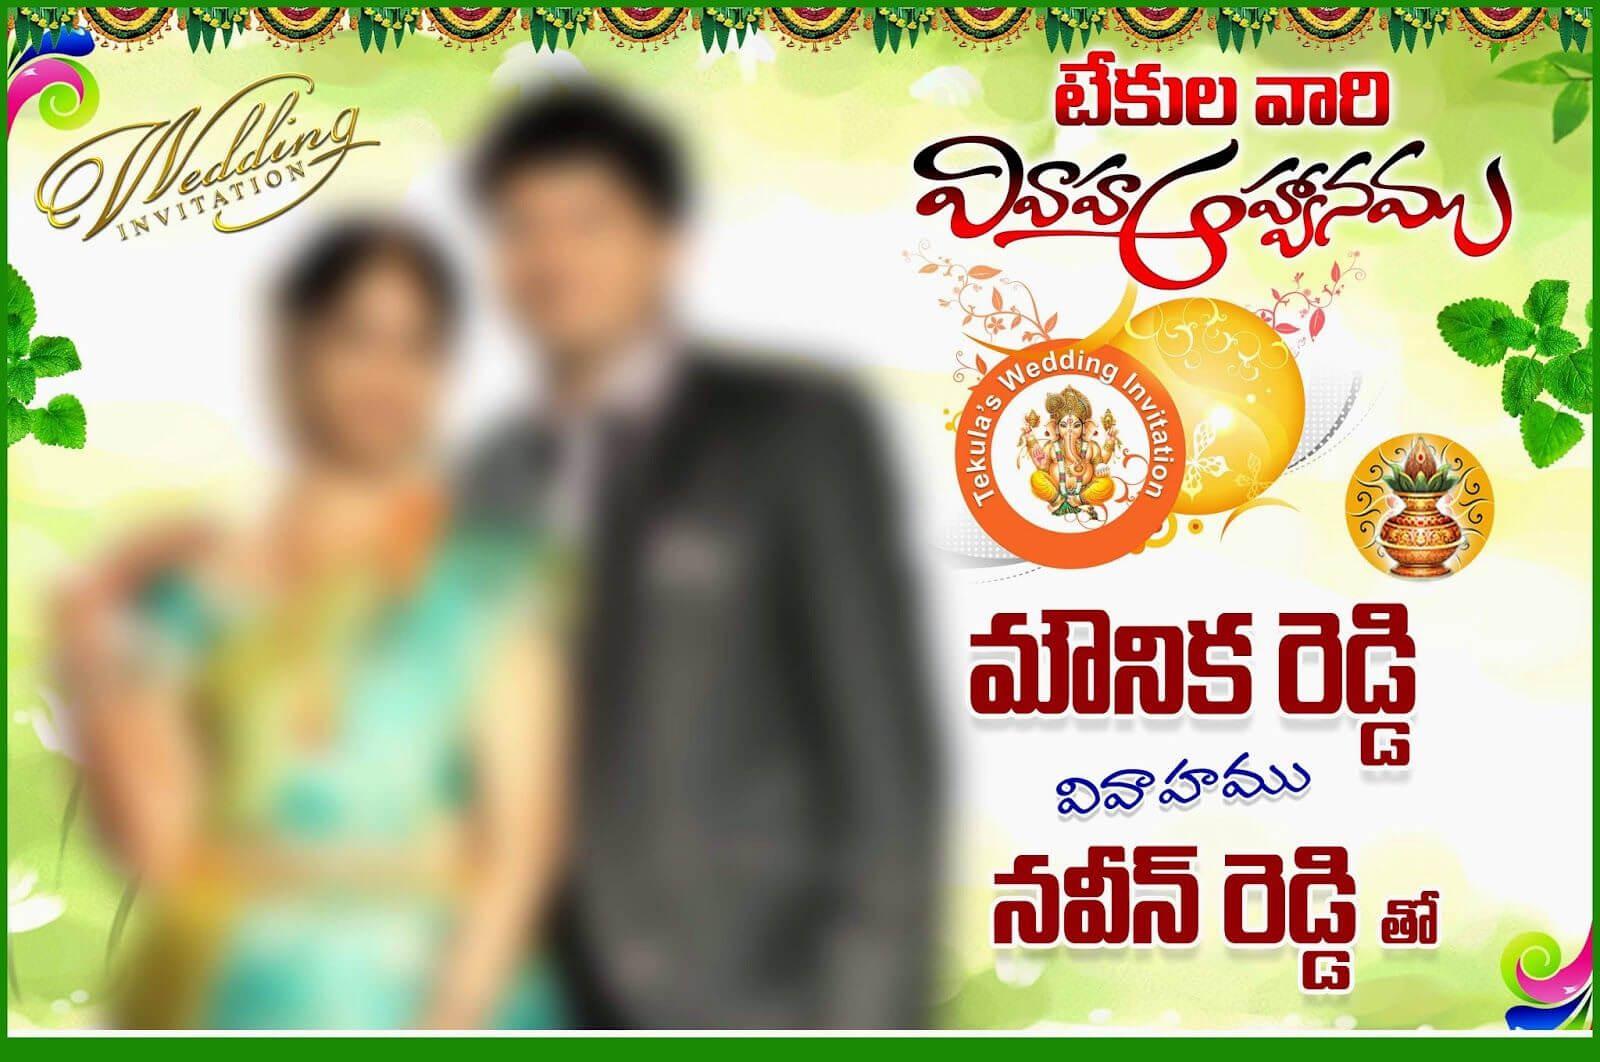 Wedding Banner Psd Templates   Wedding Banner Design Intended For Wedding Banner Design Templates